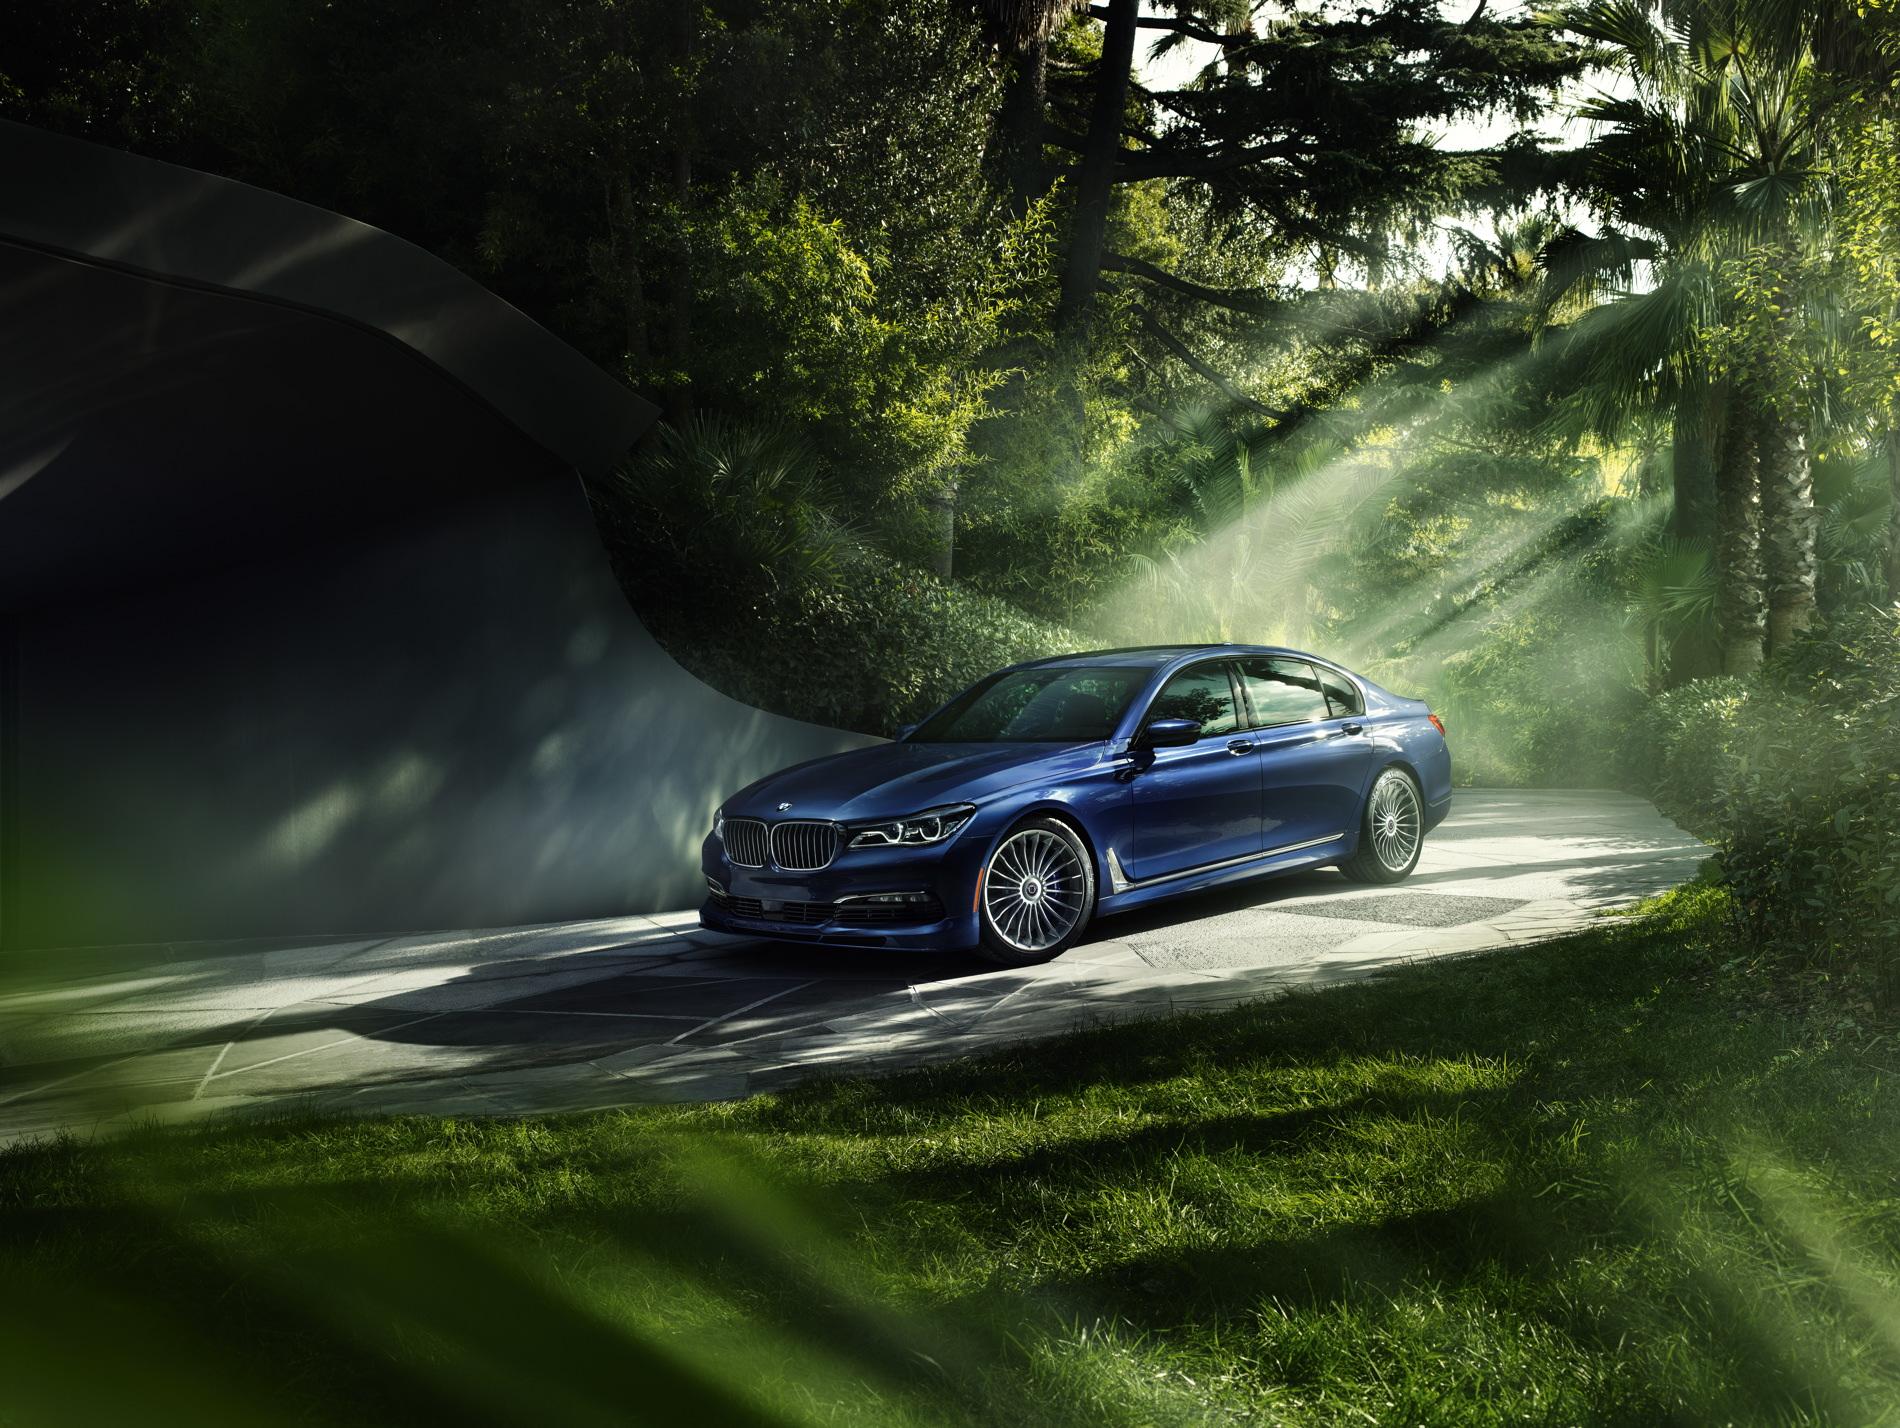 2017 BMW ALPINA B7 images 8